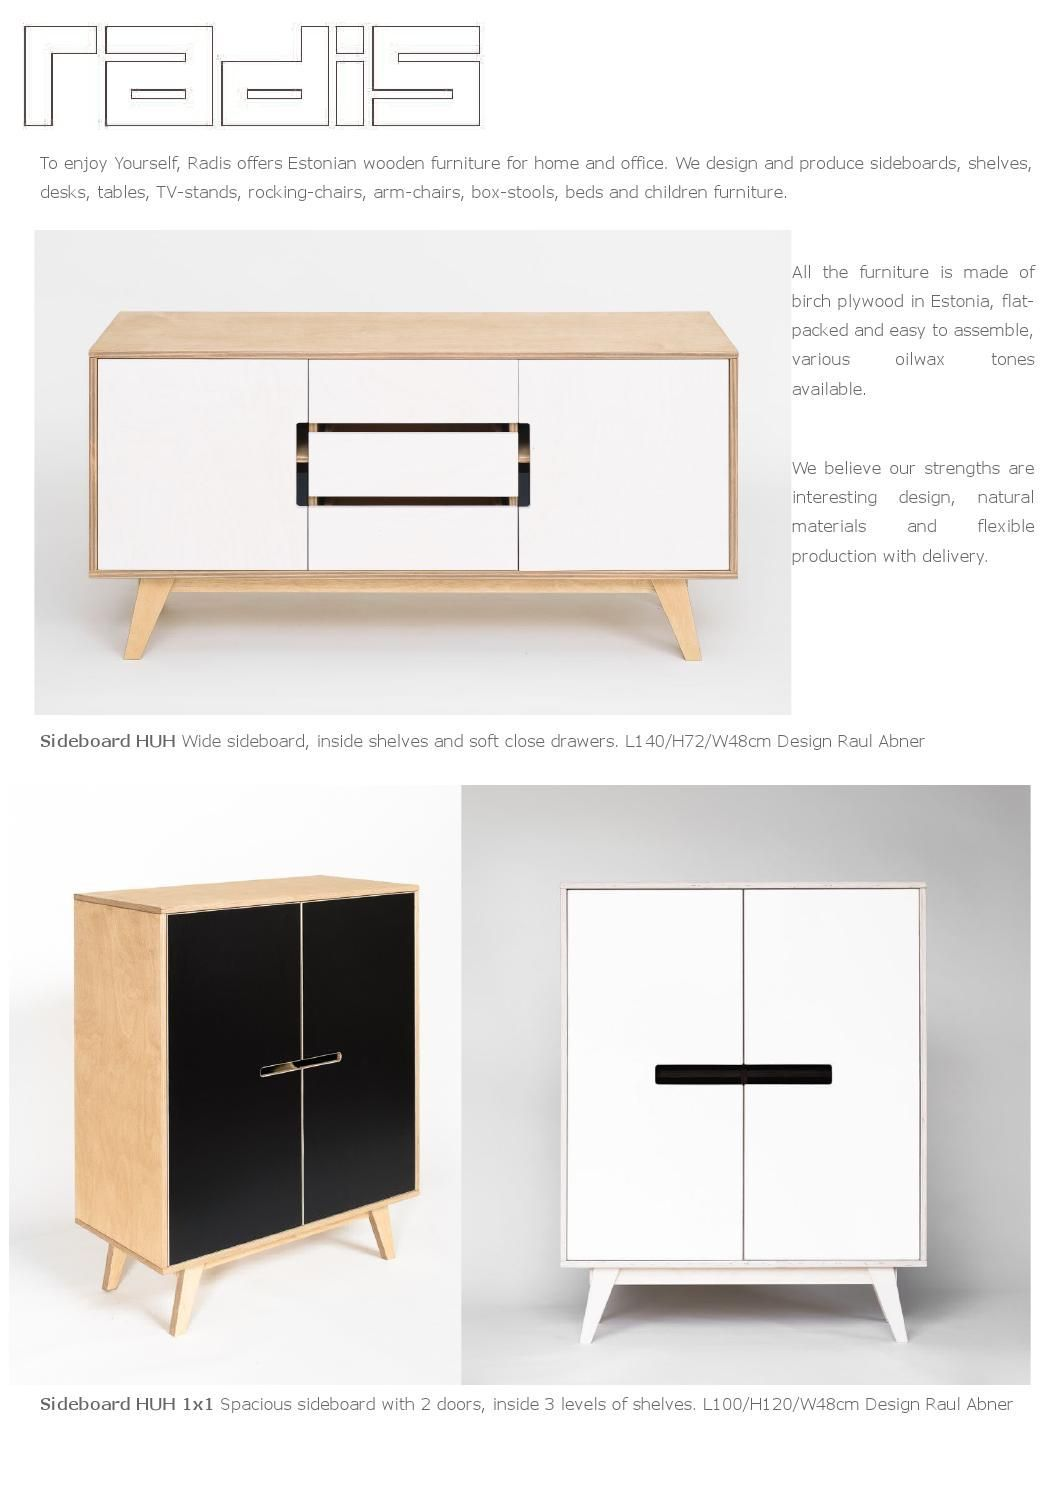 Radis Furniture Catalogue 2016 Radis Furniture Catalogue 2016 I